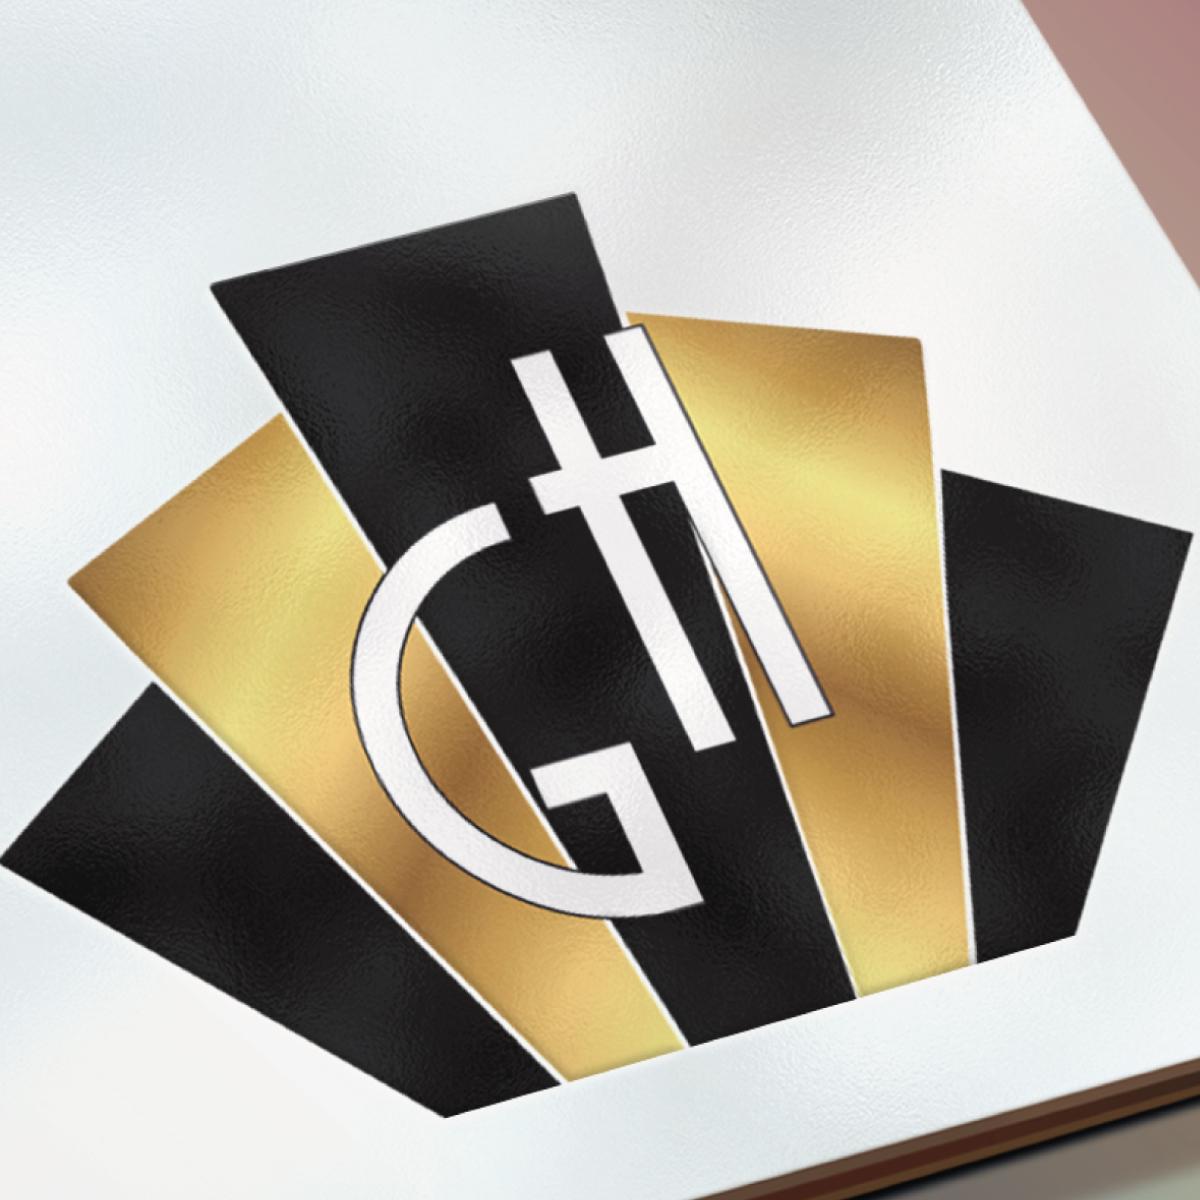 3 Women Logo design by Viviane Williams Consultancy